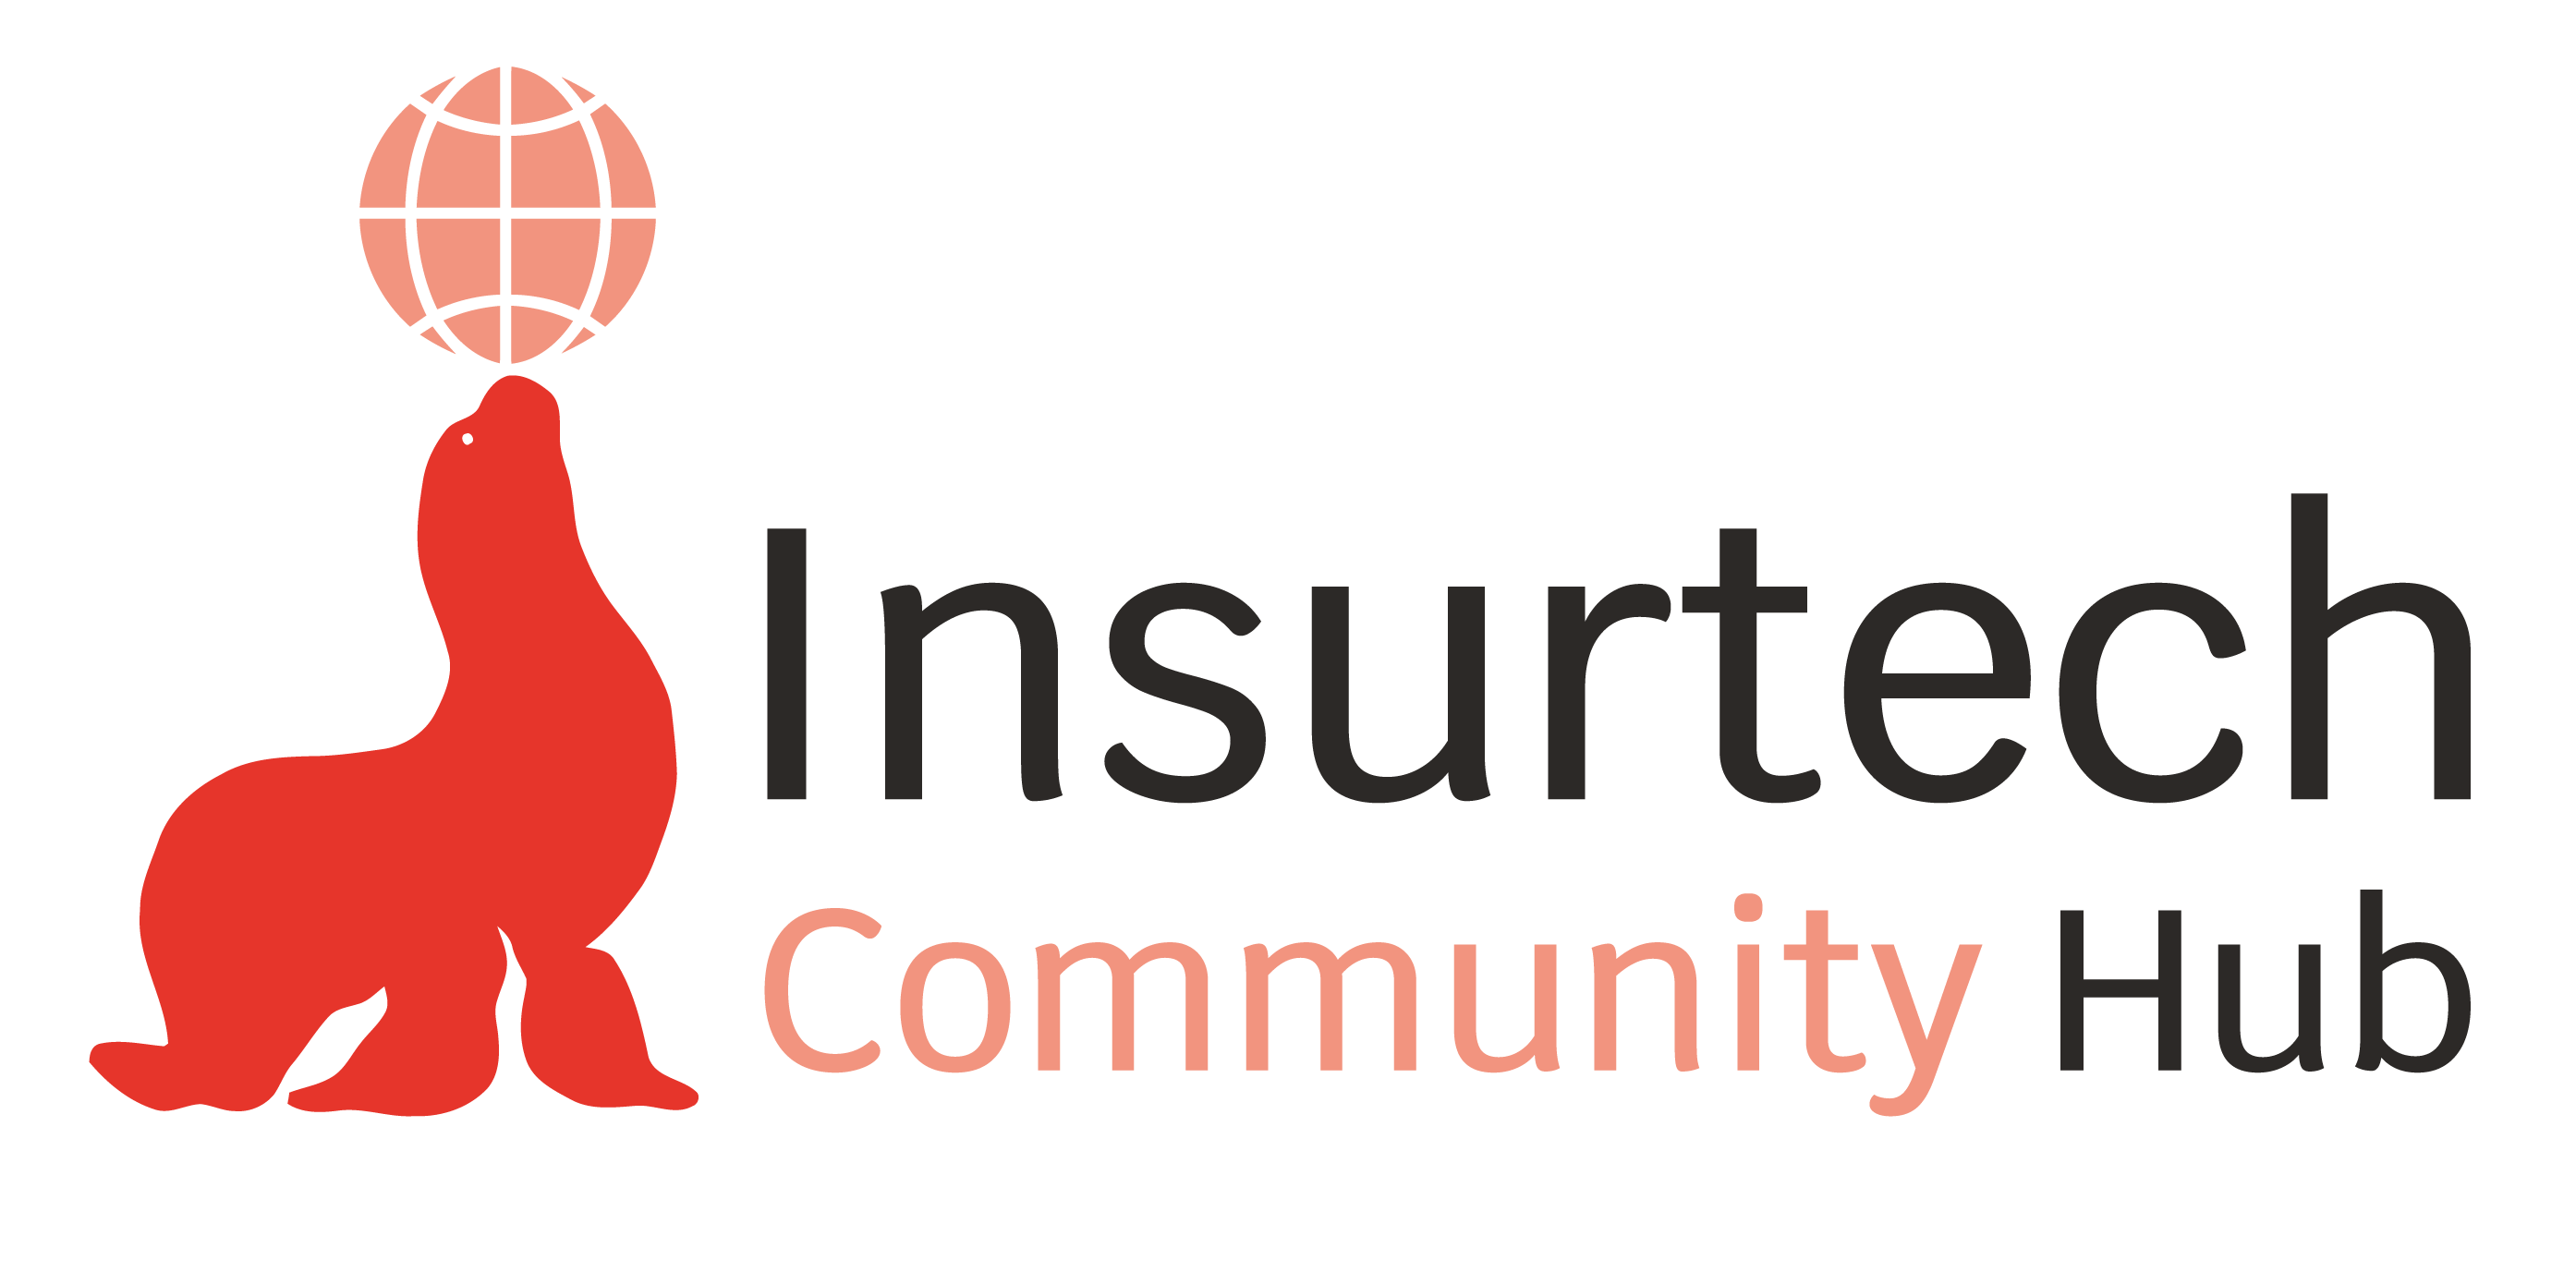 Insurtech Community Hub